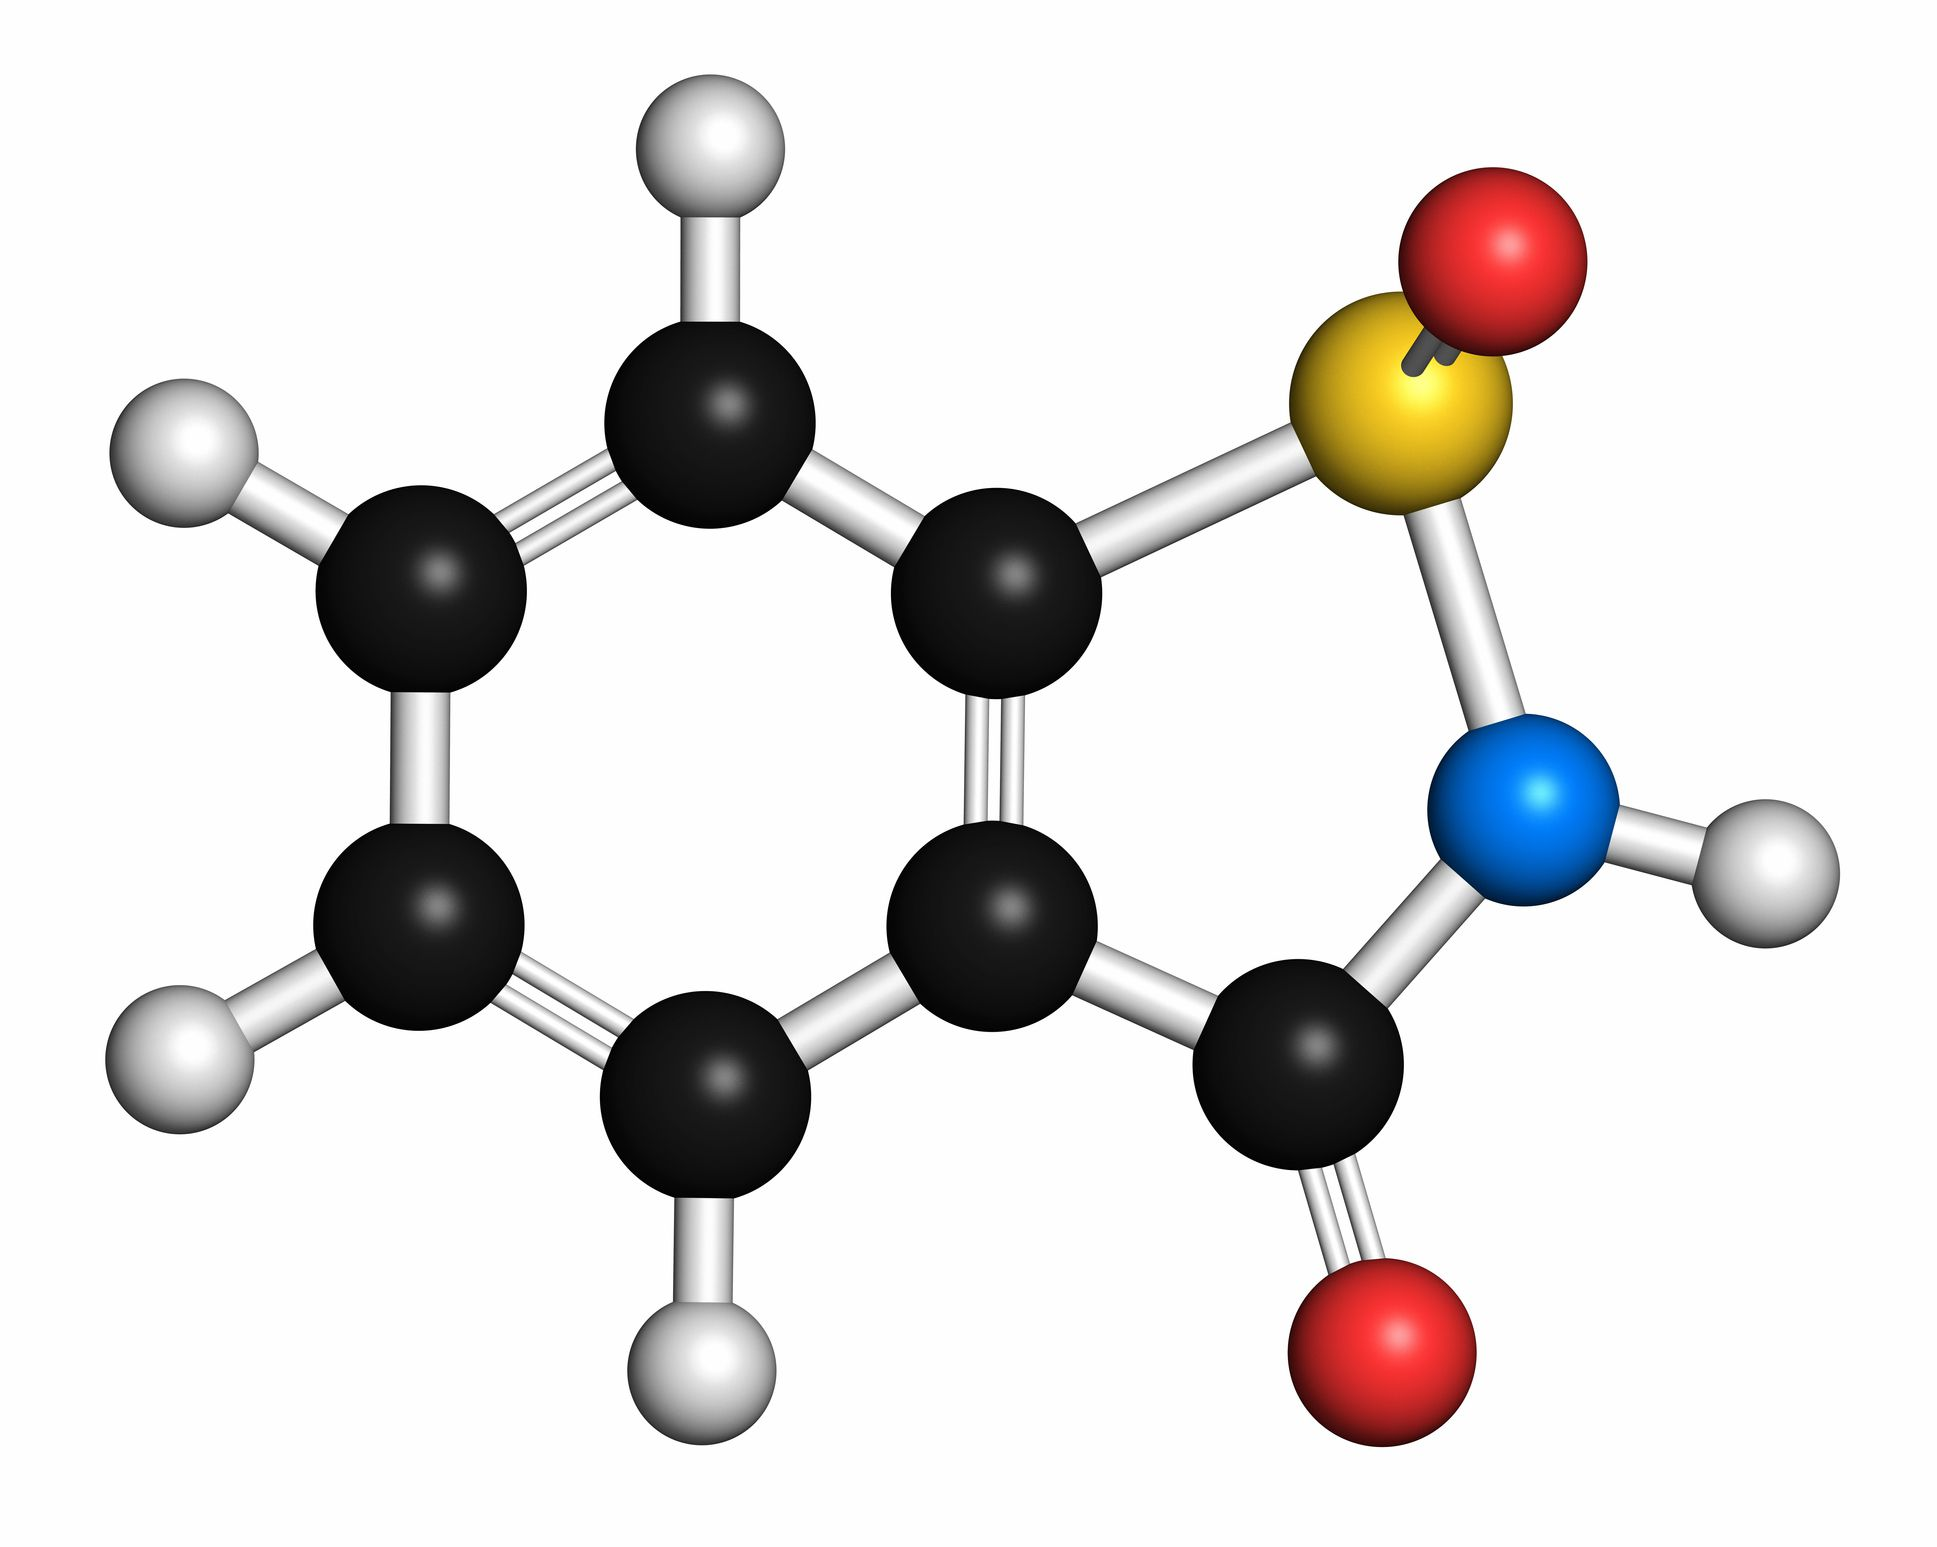 La sacarina o sulfinuro benzoico es un edulcorante artificial.